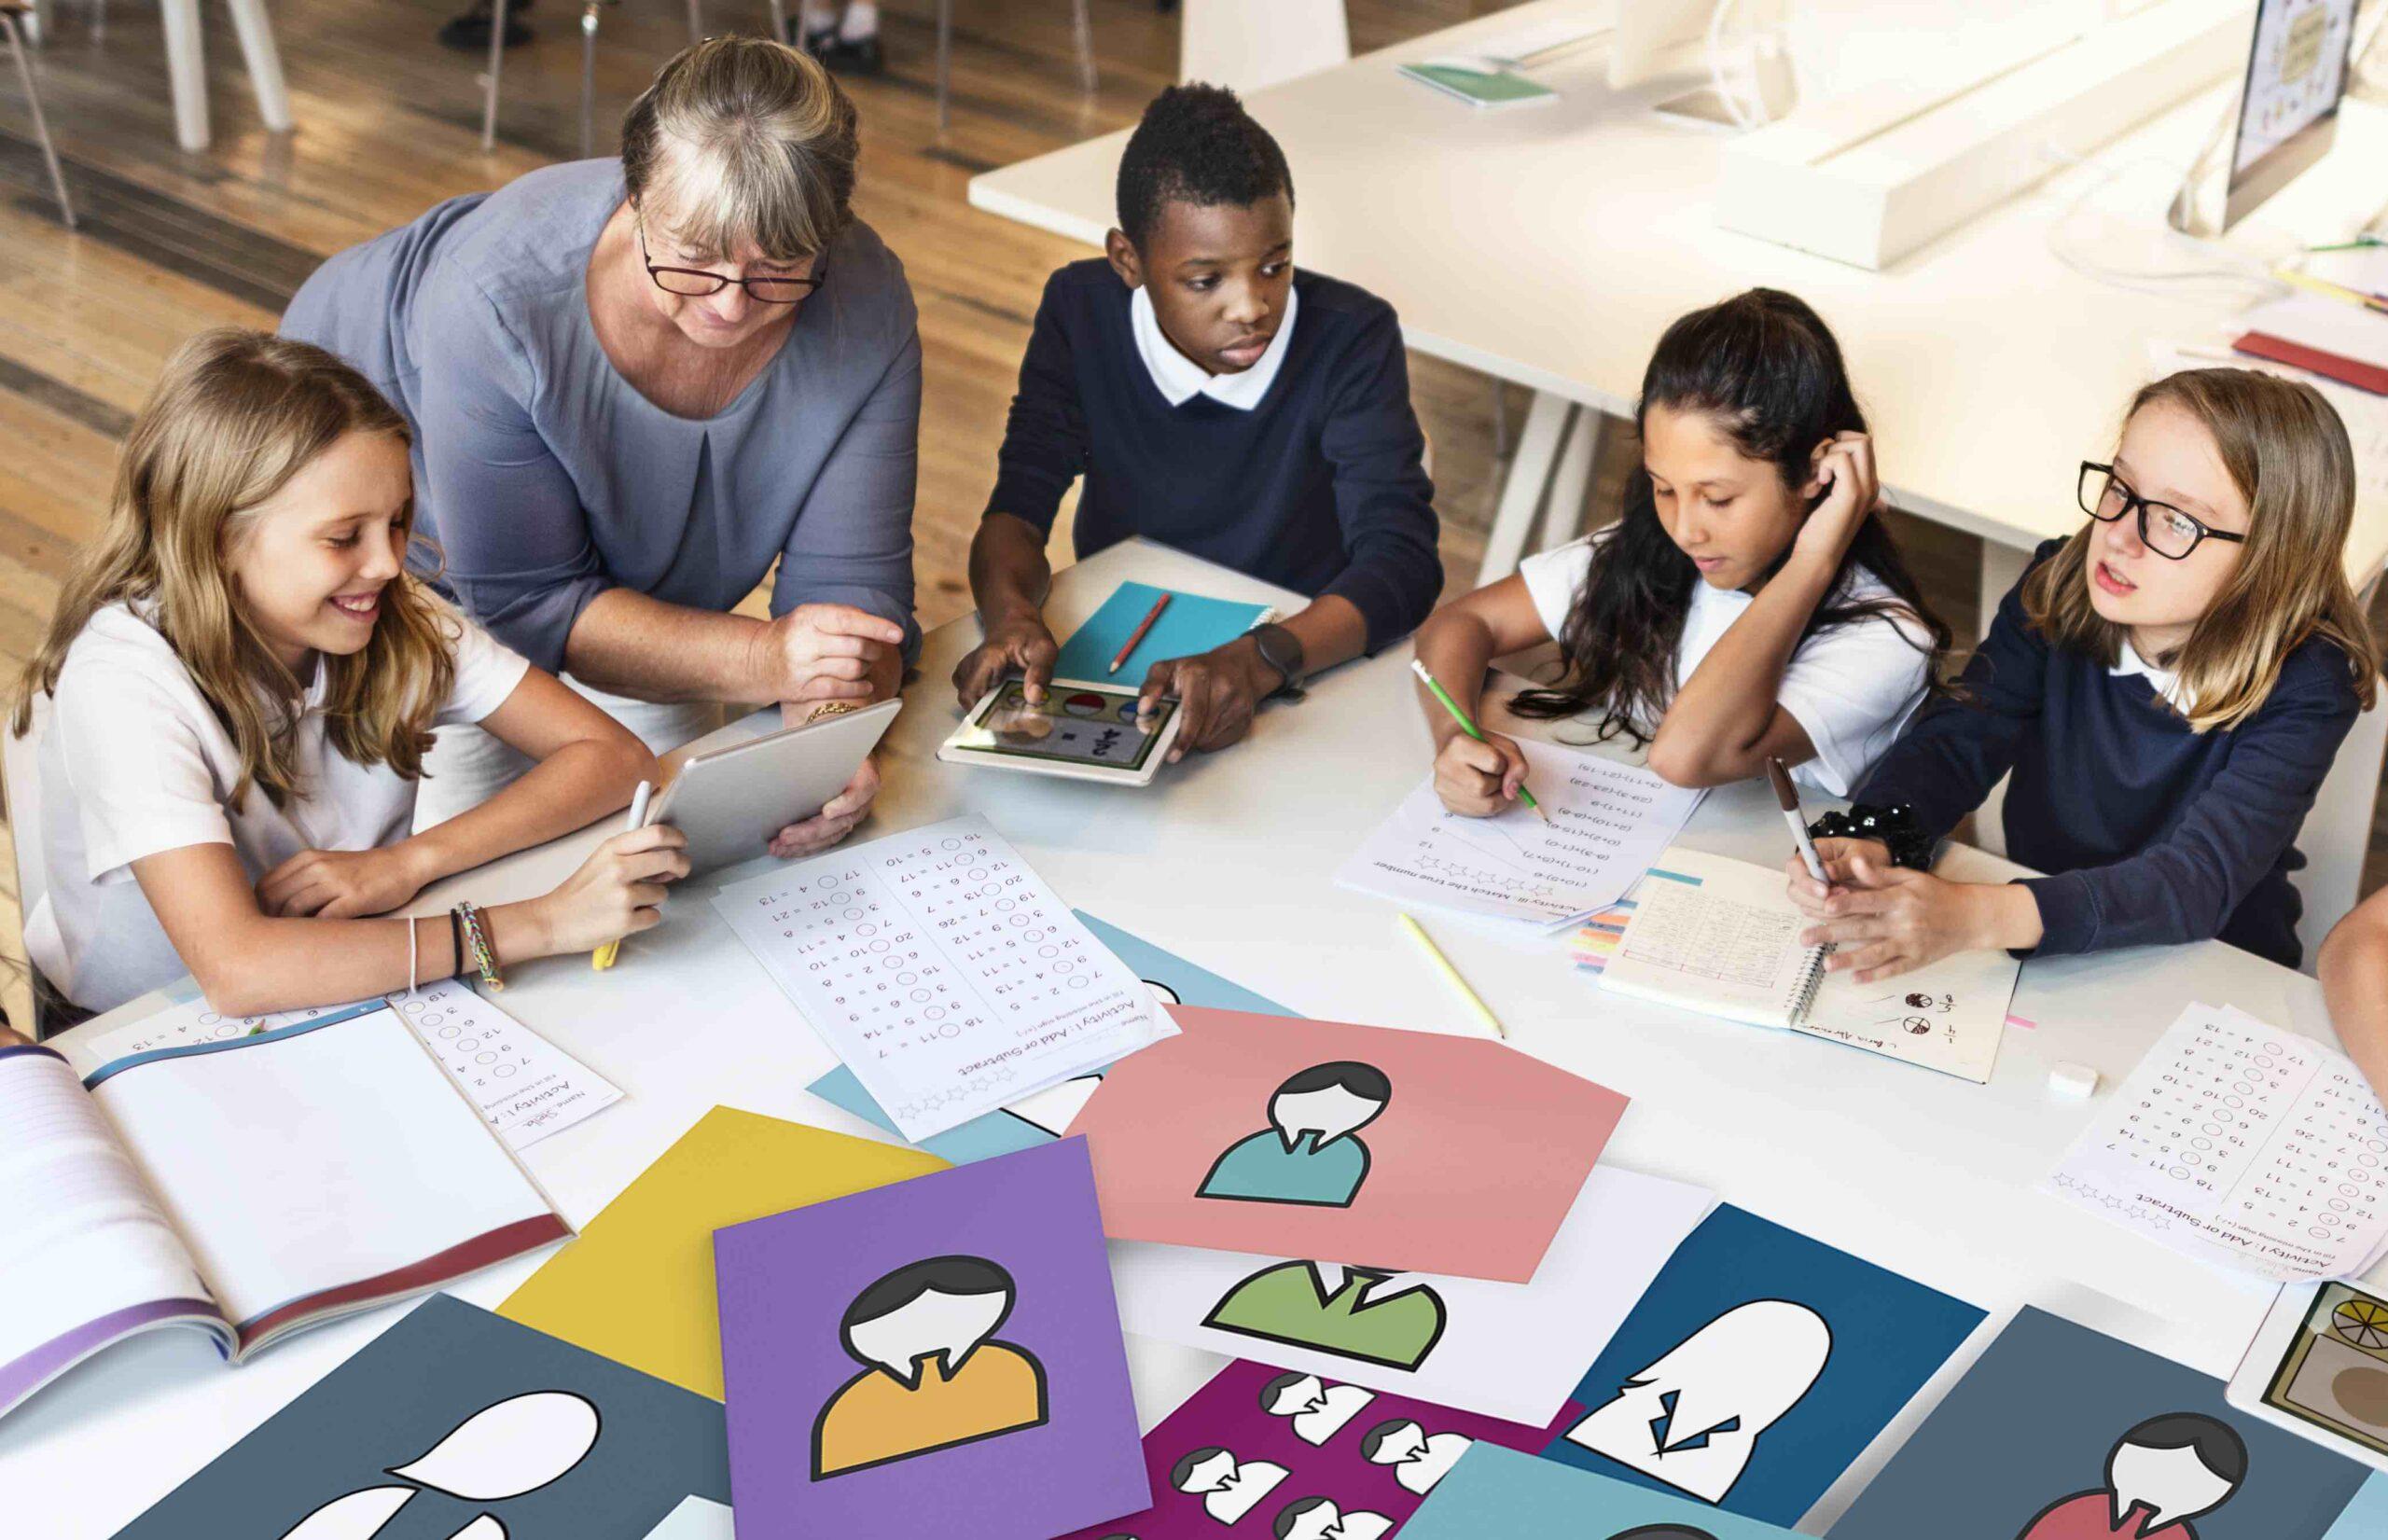 Effectief leren met blended learning